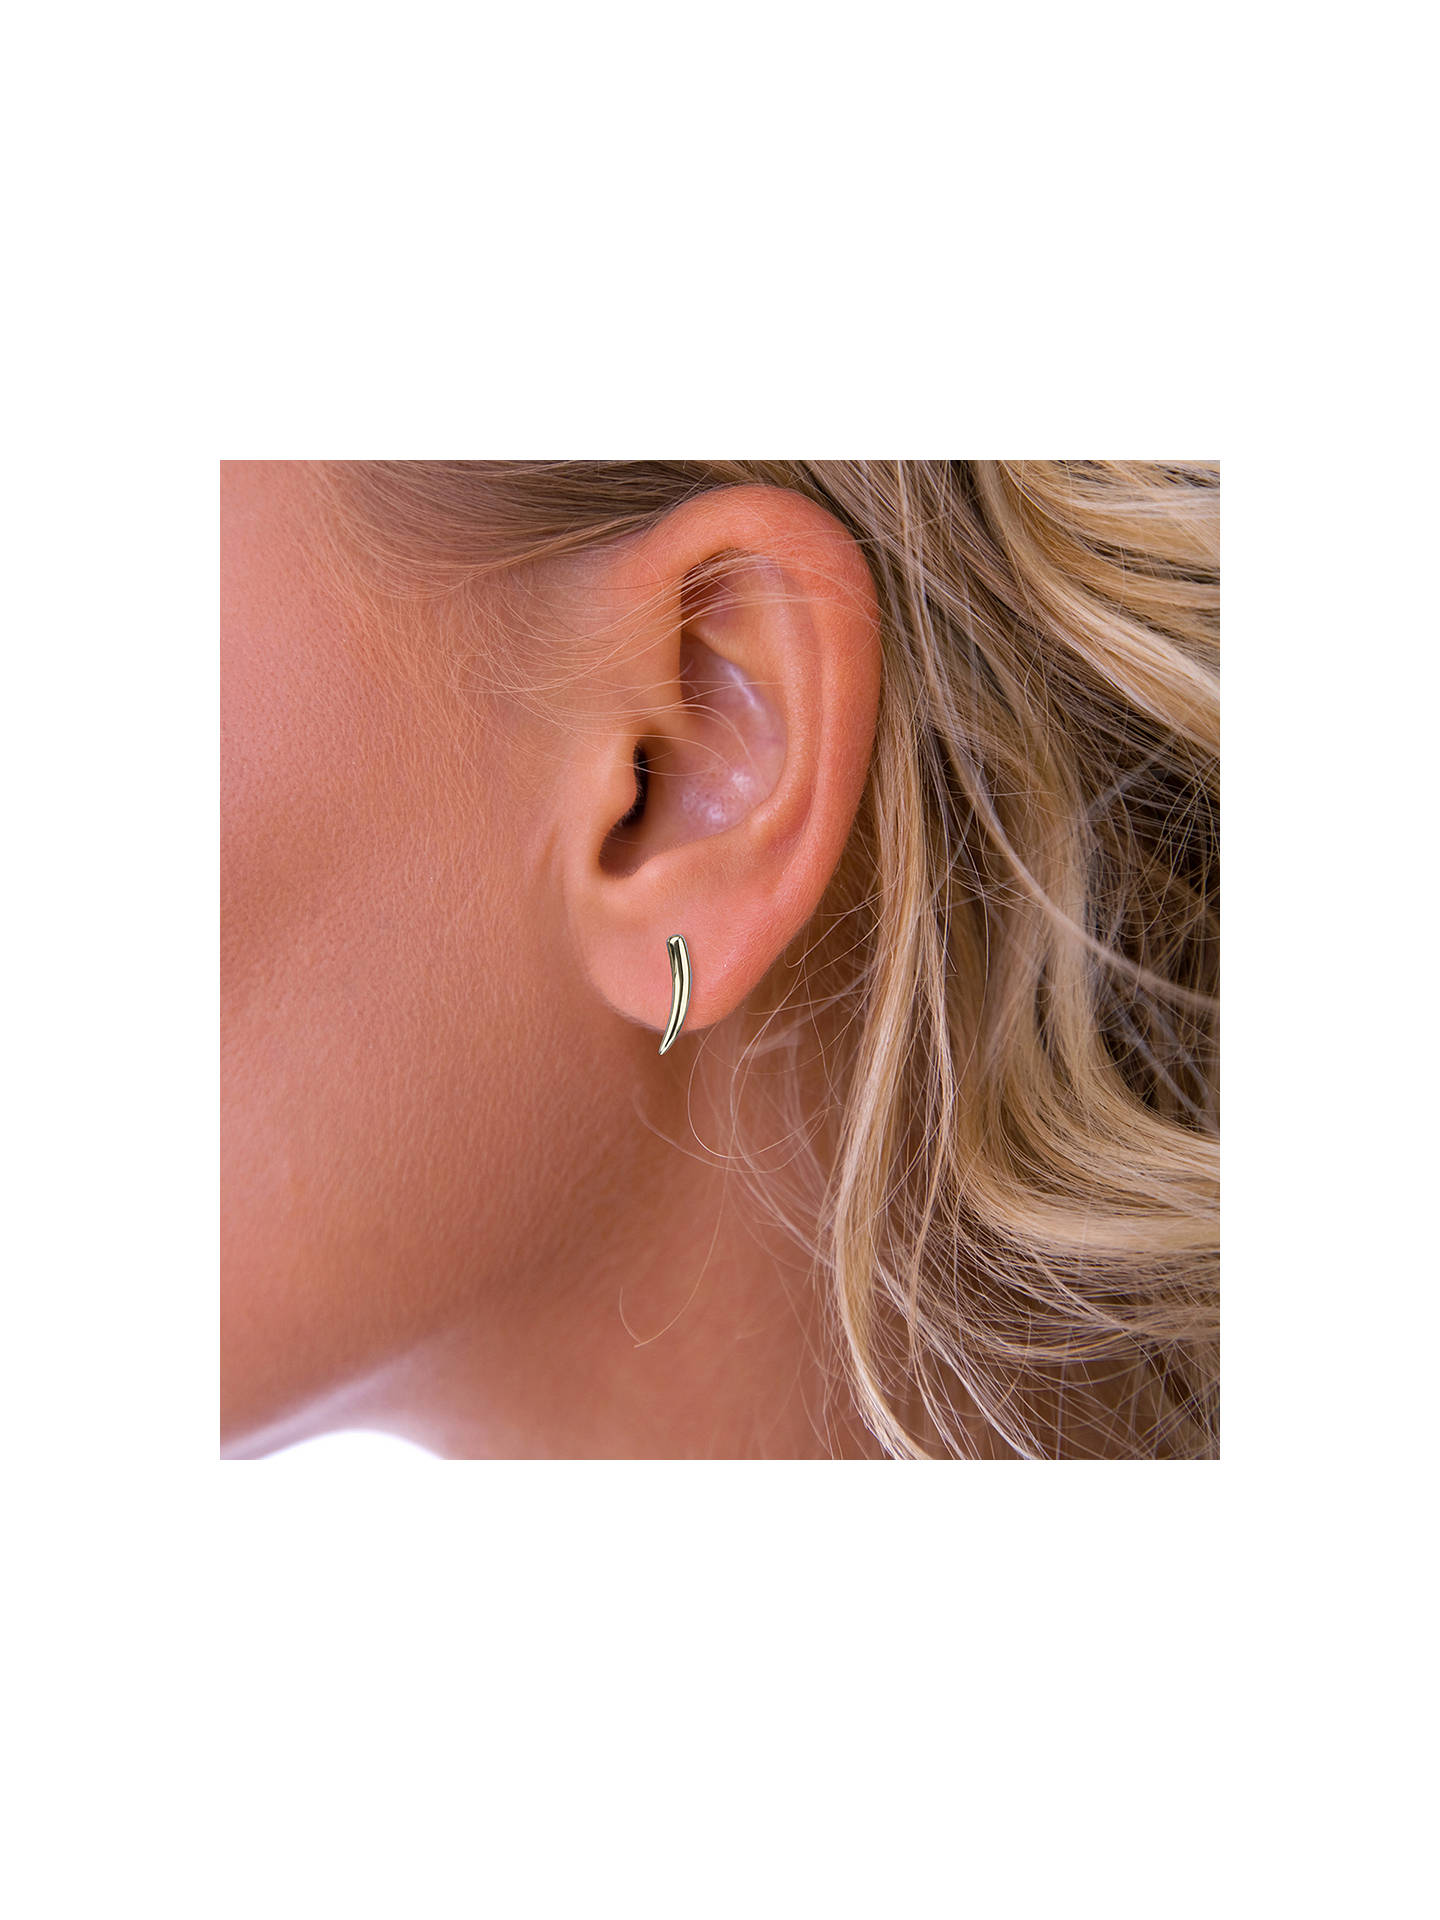 071df1496 Buy Nina B 9ct Yellow Gold Curved Slim Bar Earrings, Gold Online at  johnlewis.